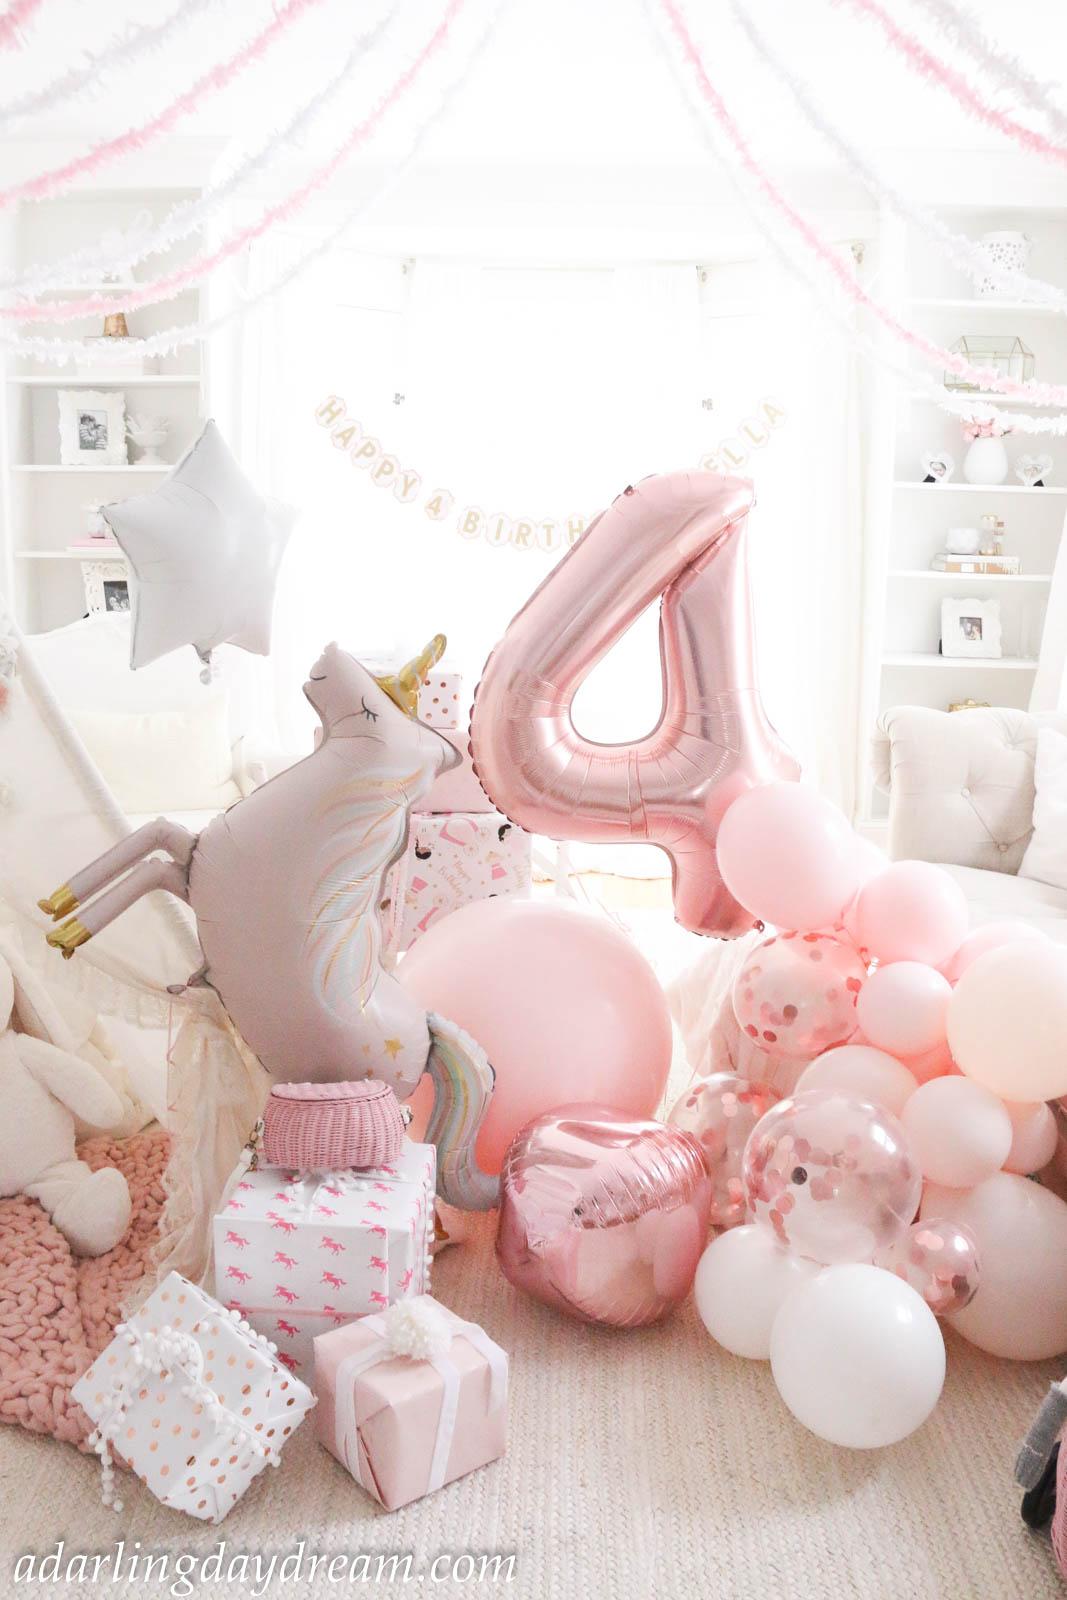 Bella-s-4th-Birthday-morning-surprise-12